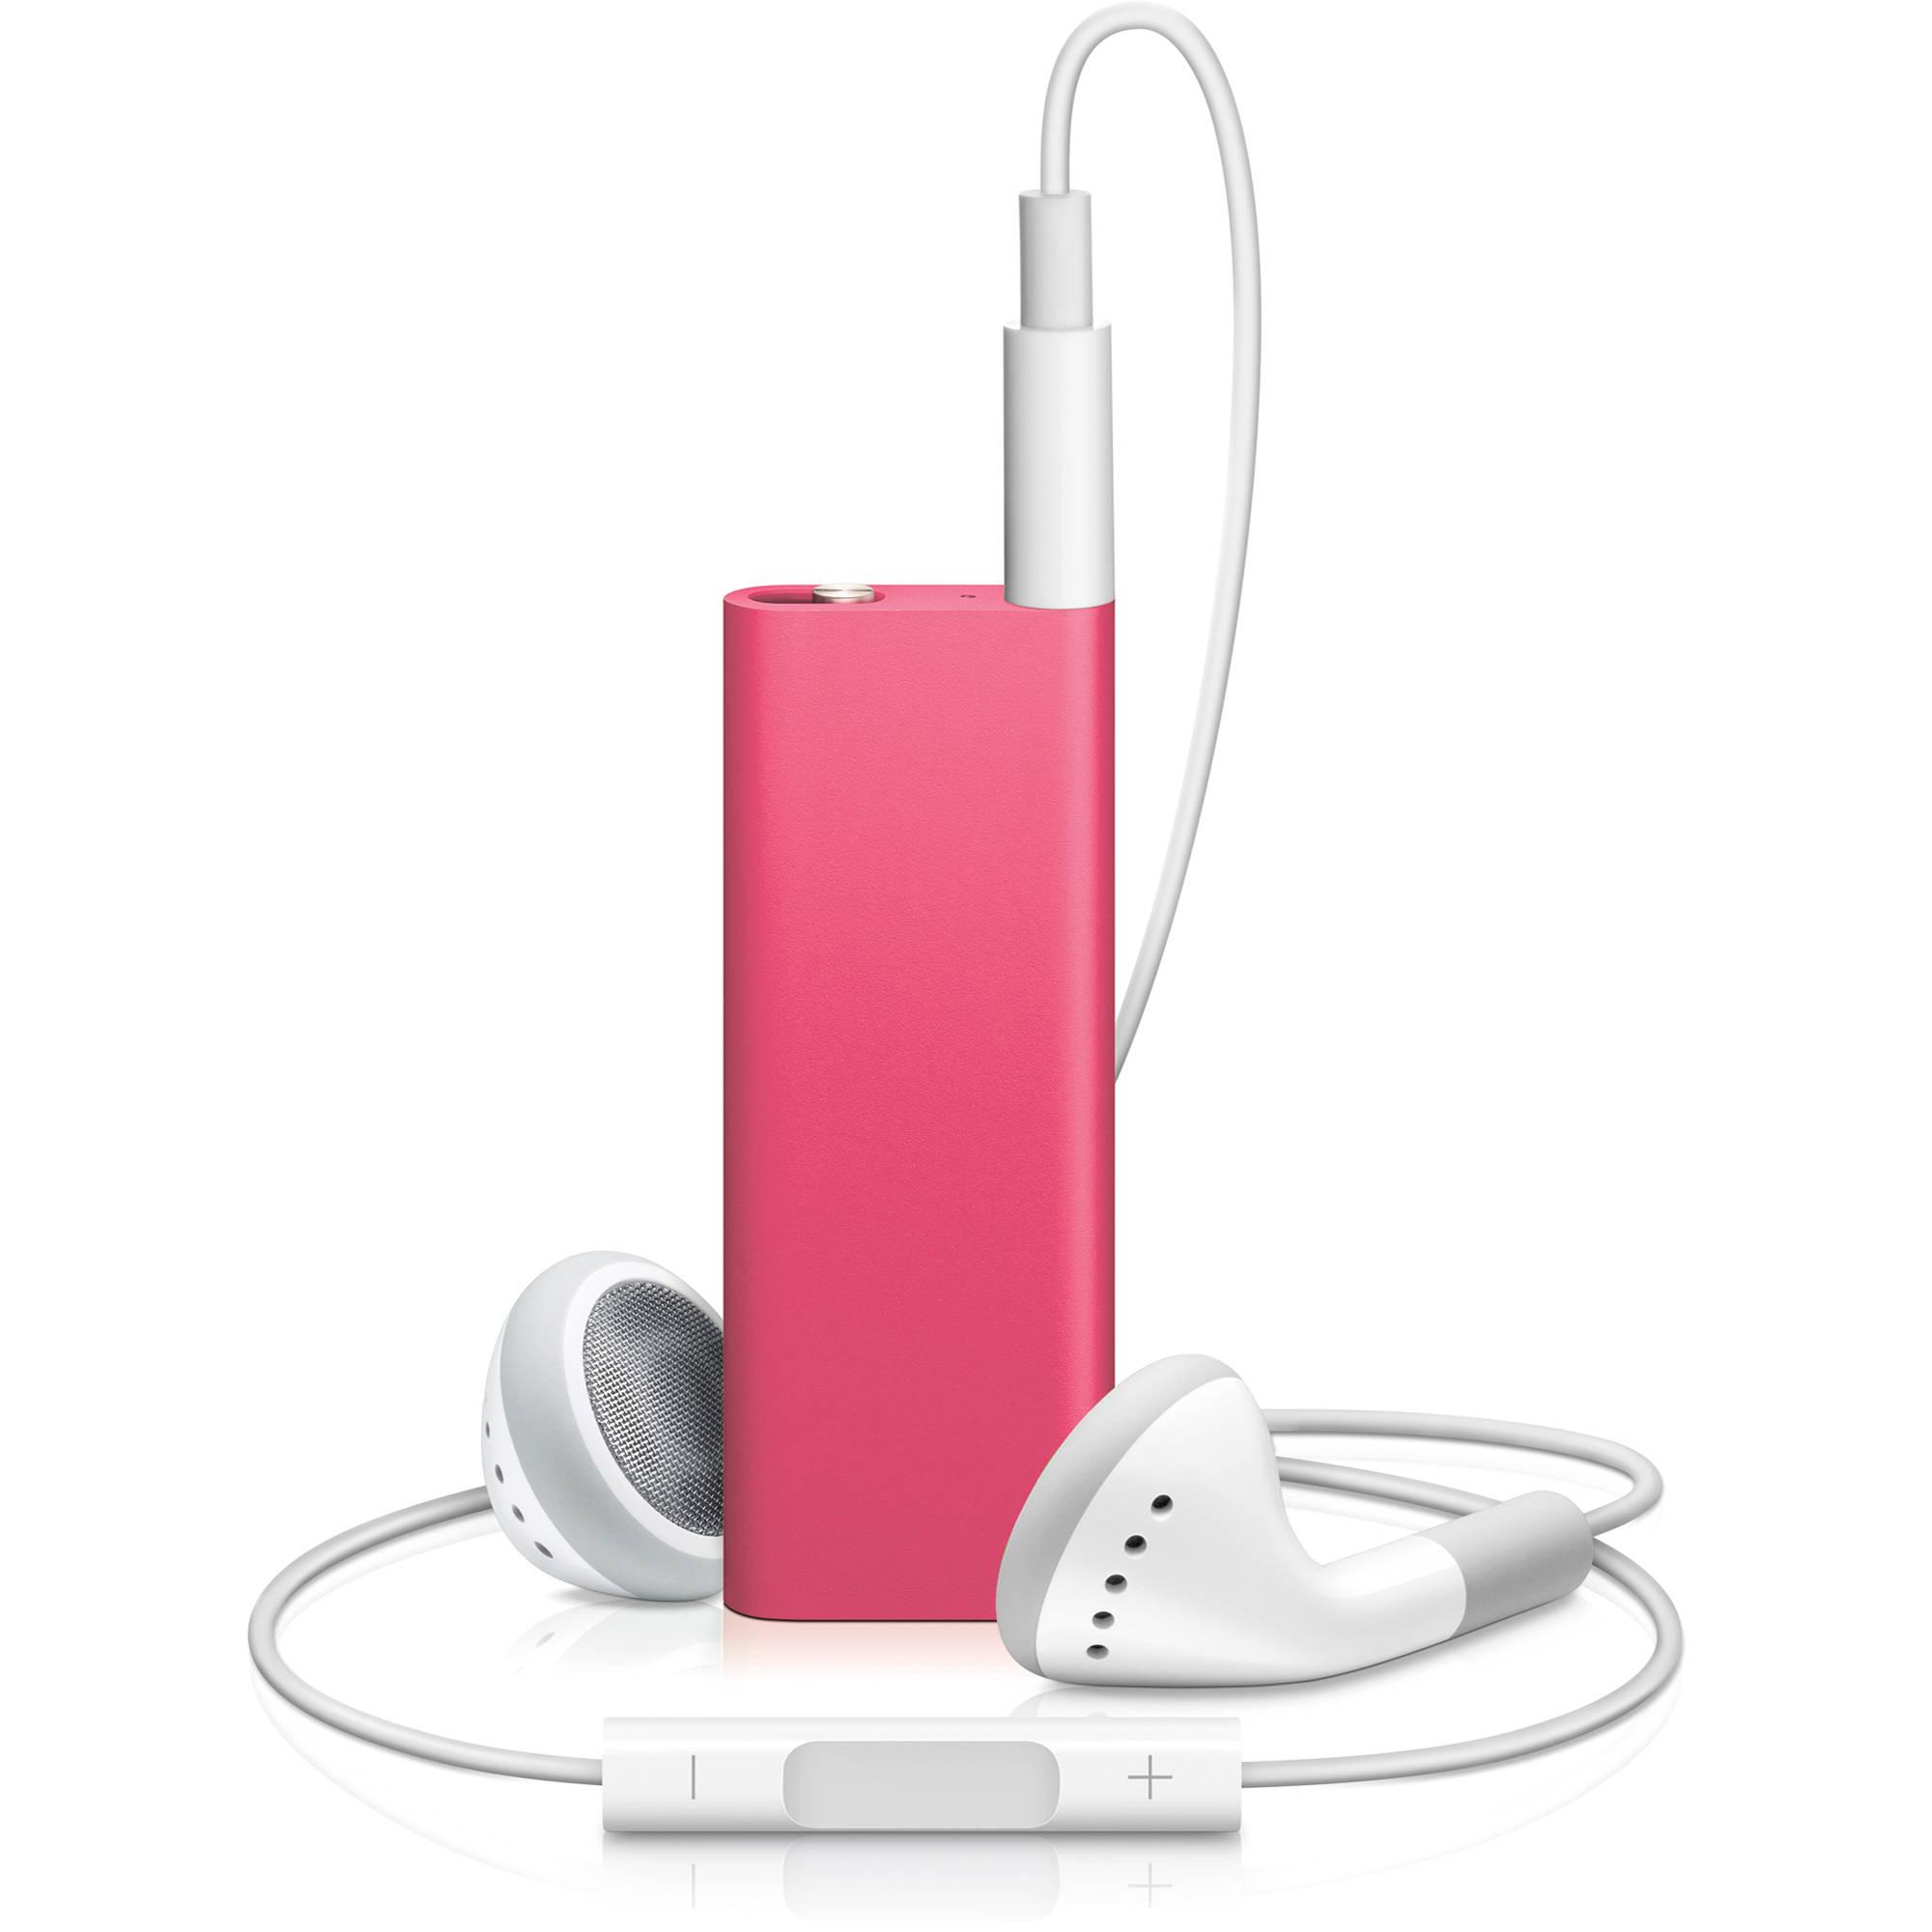 Ipod Shuffle Generations Comparison